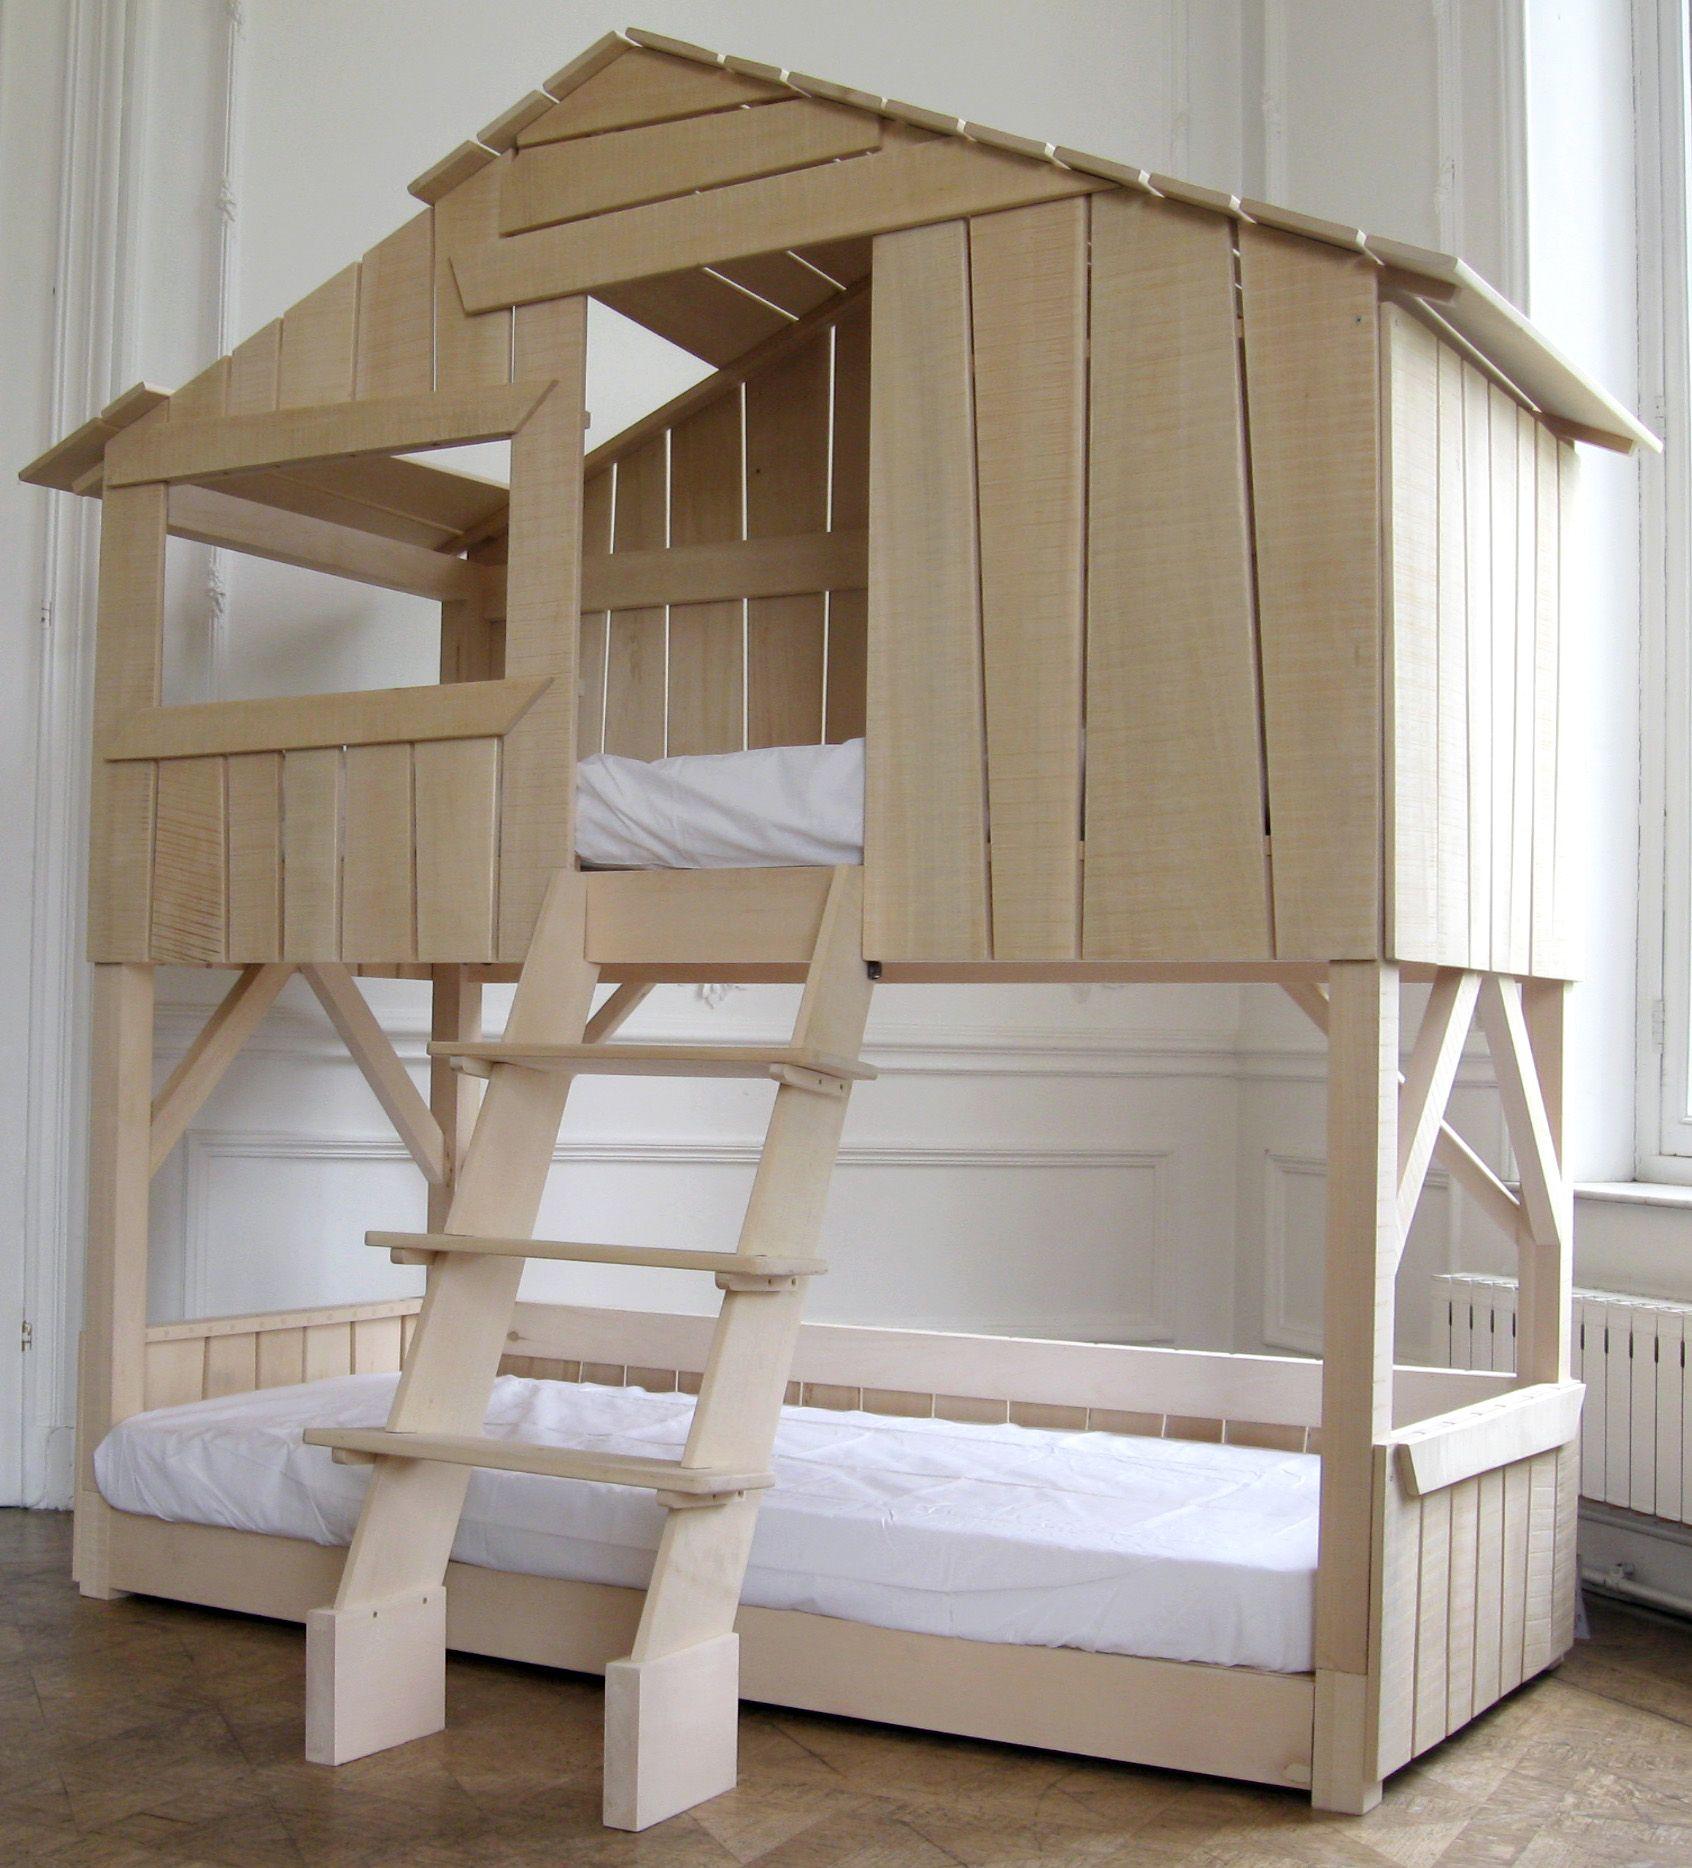 Amazing tree bunk beds